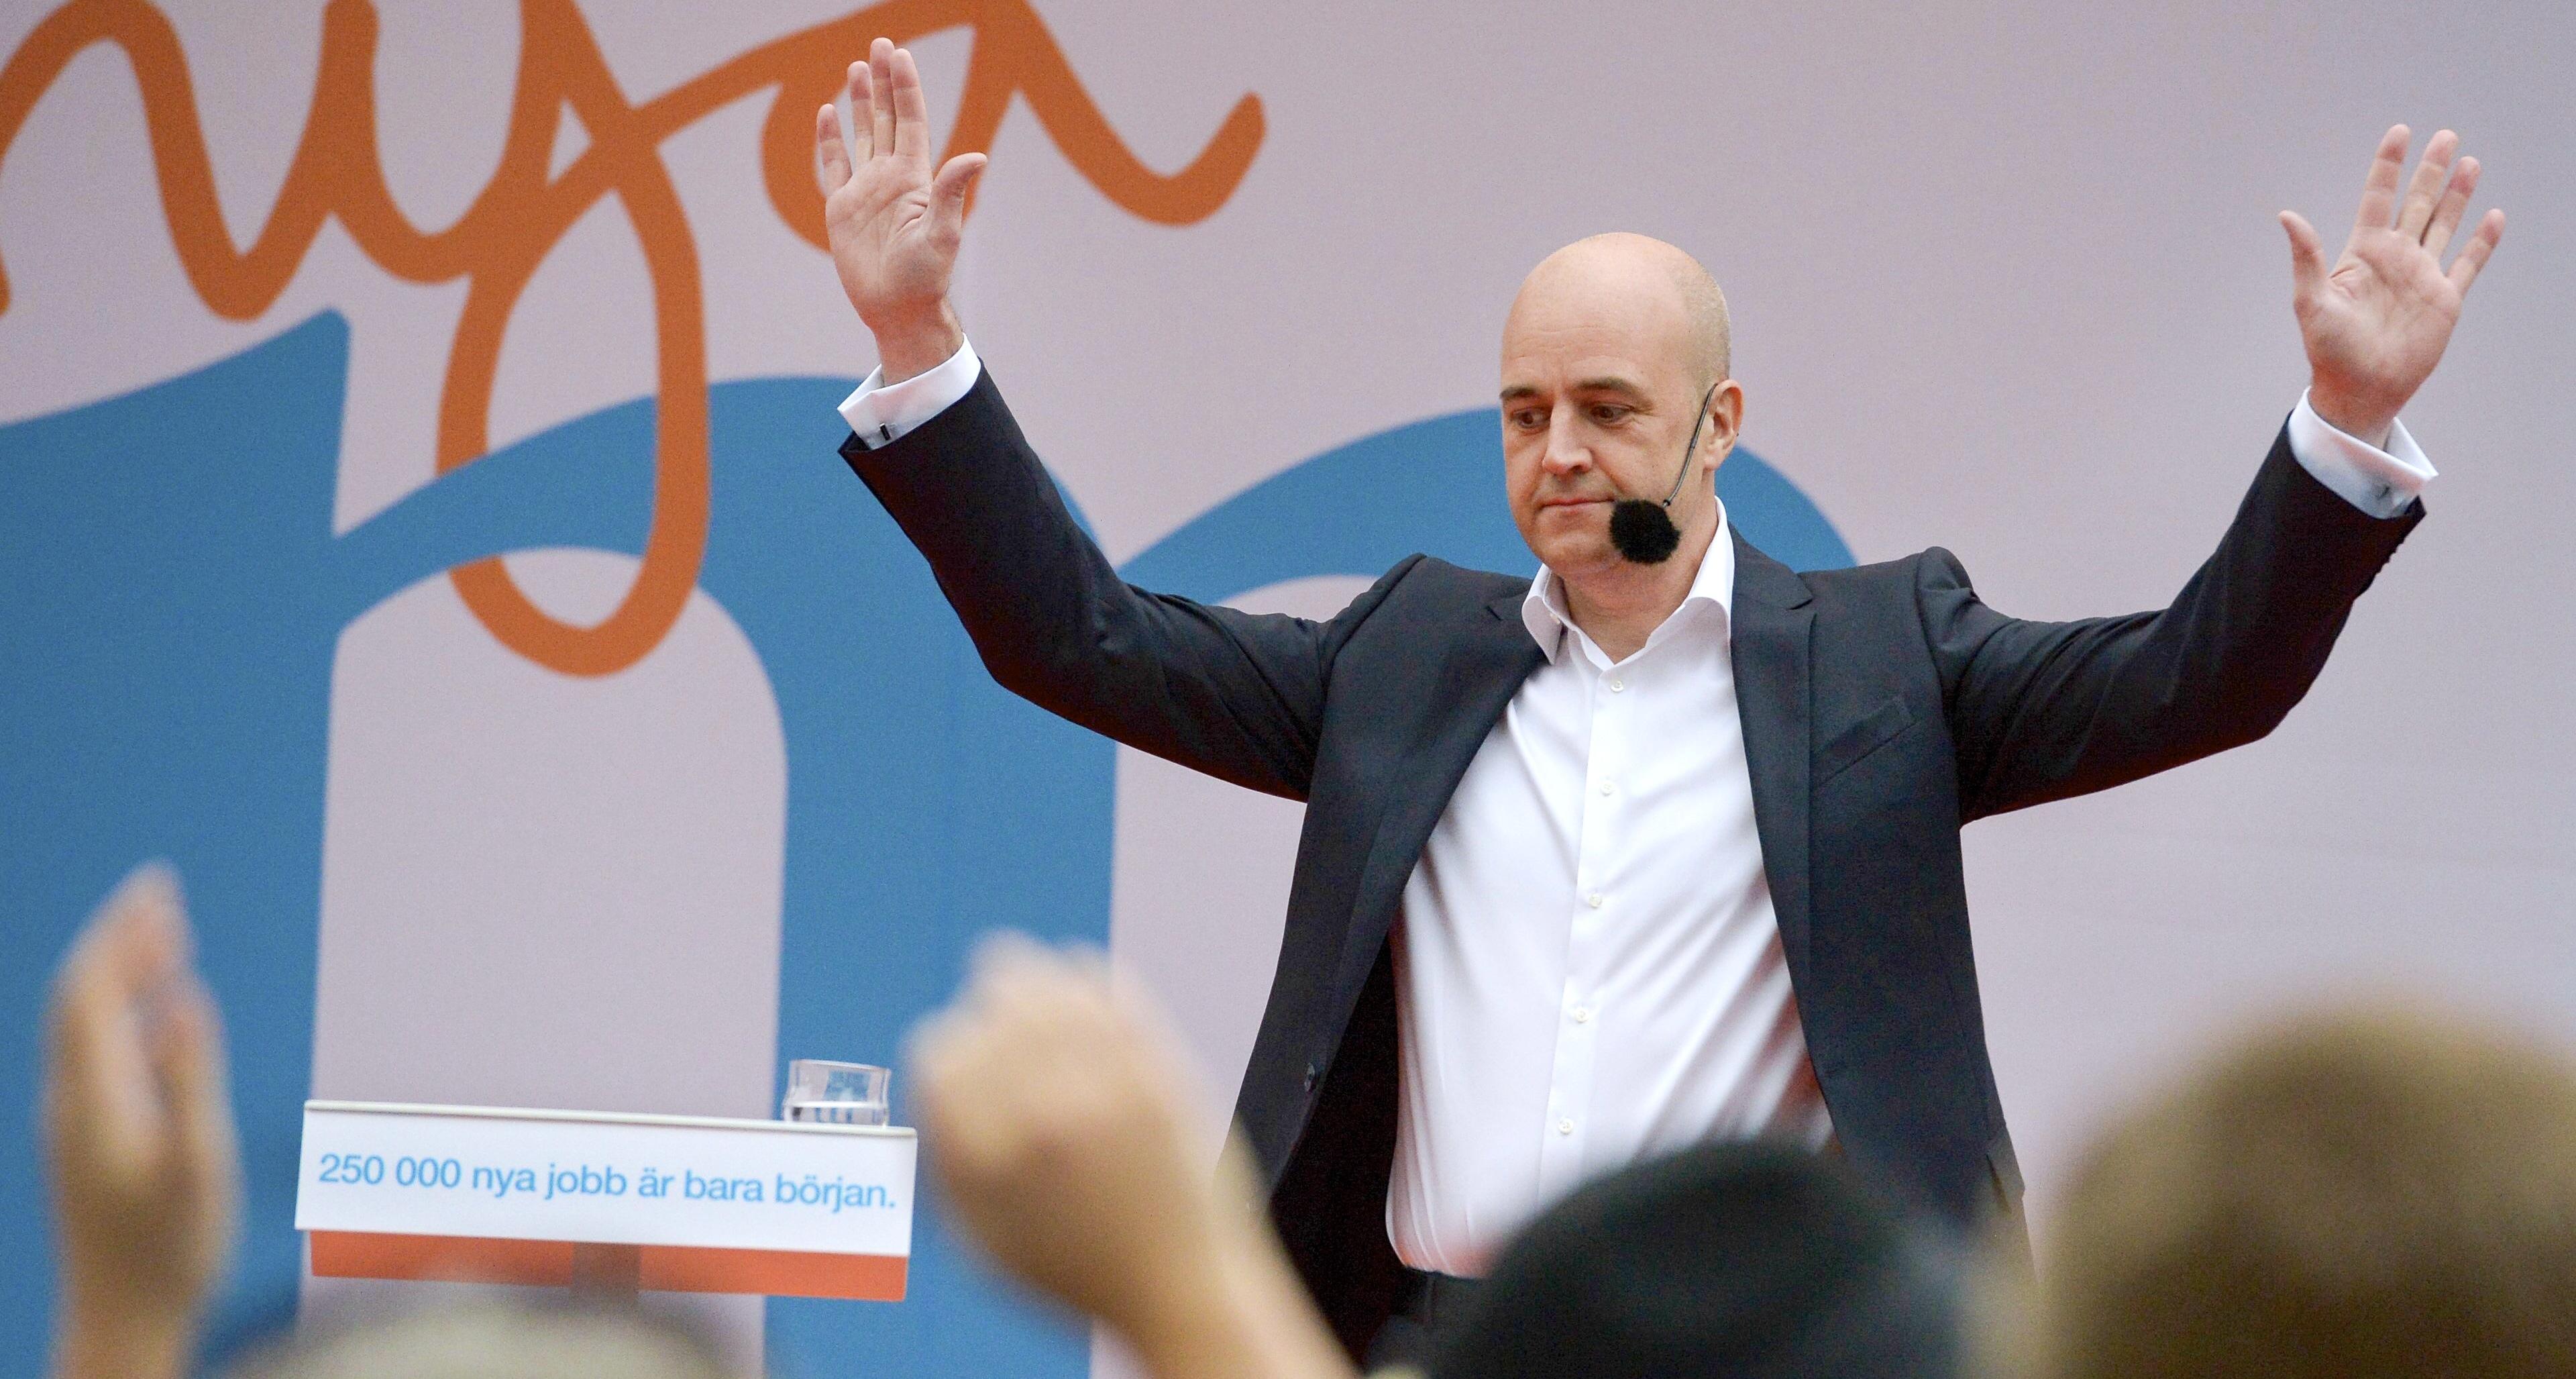 Moderaternas ledare Fredrik Reinfeldt pratade om politik i Almedalen. Foto: Janerik Henriksson/TT